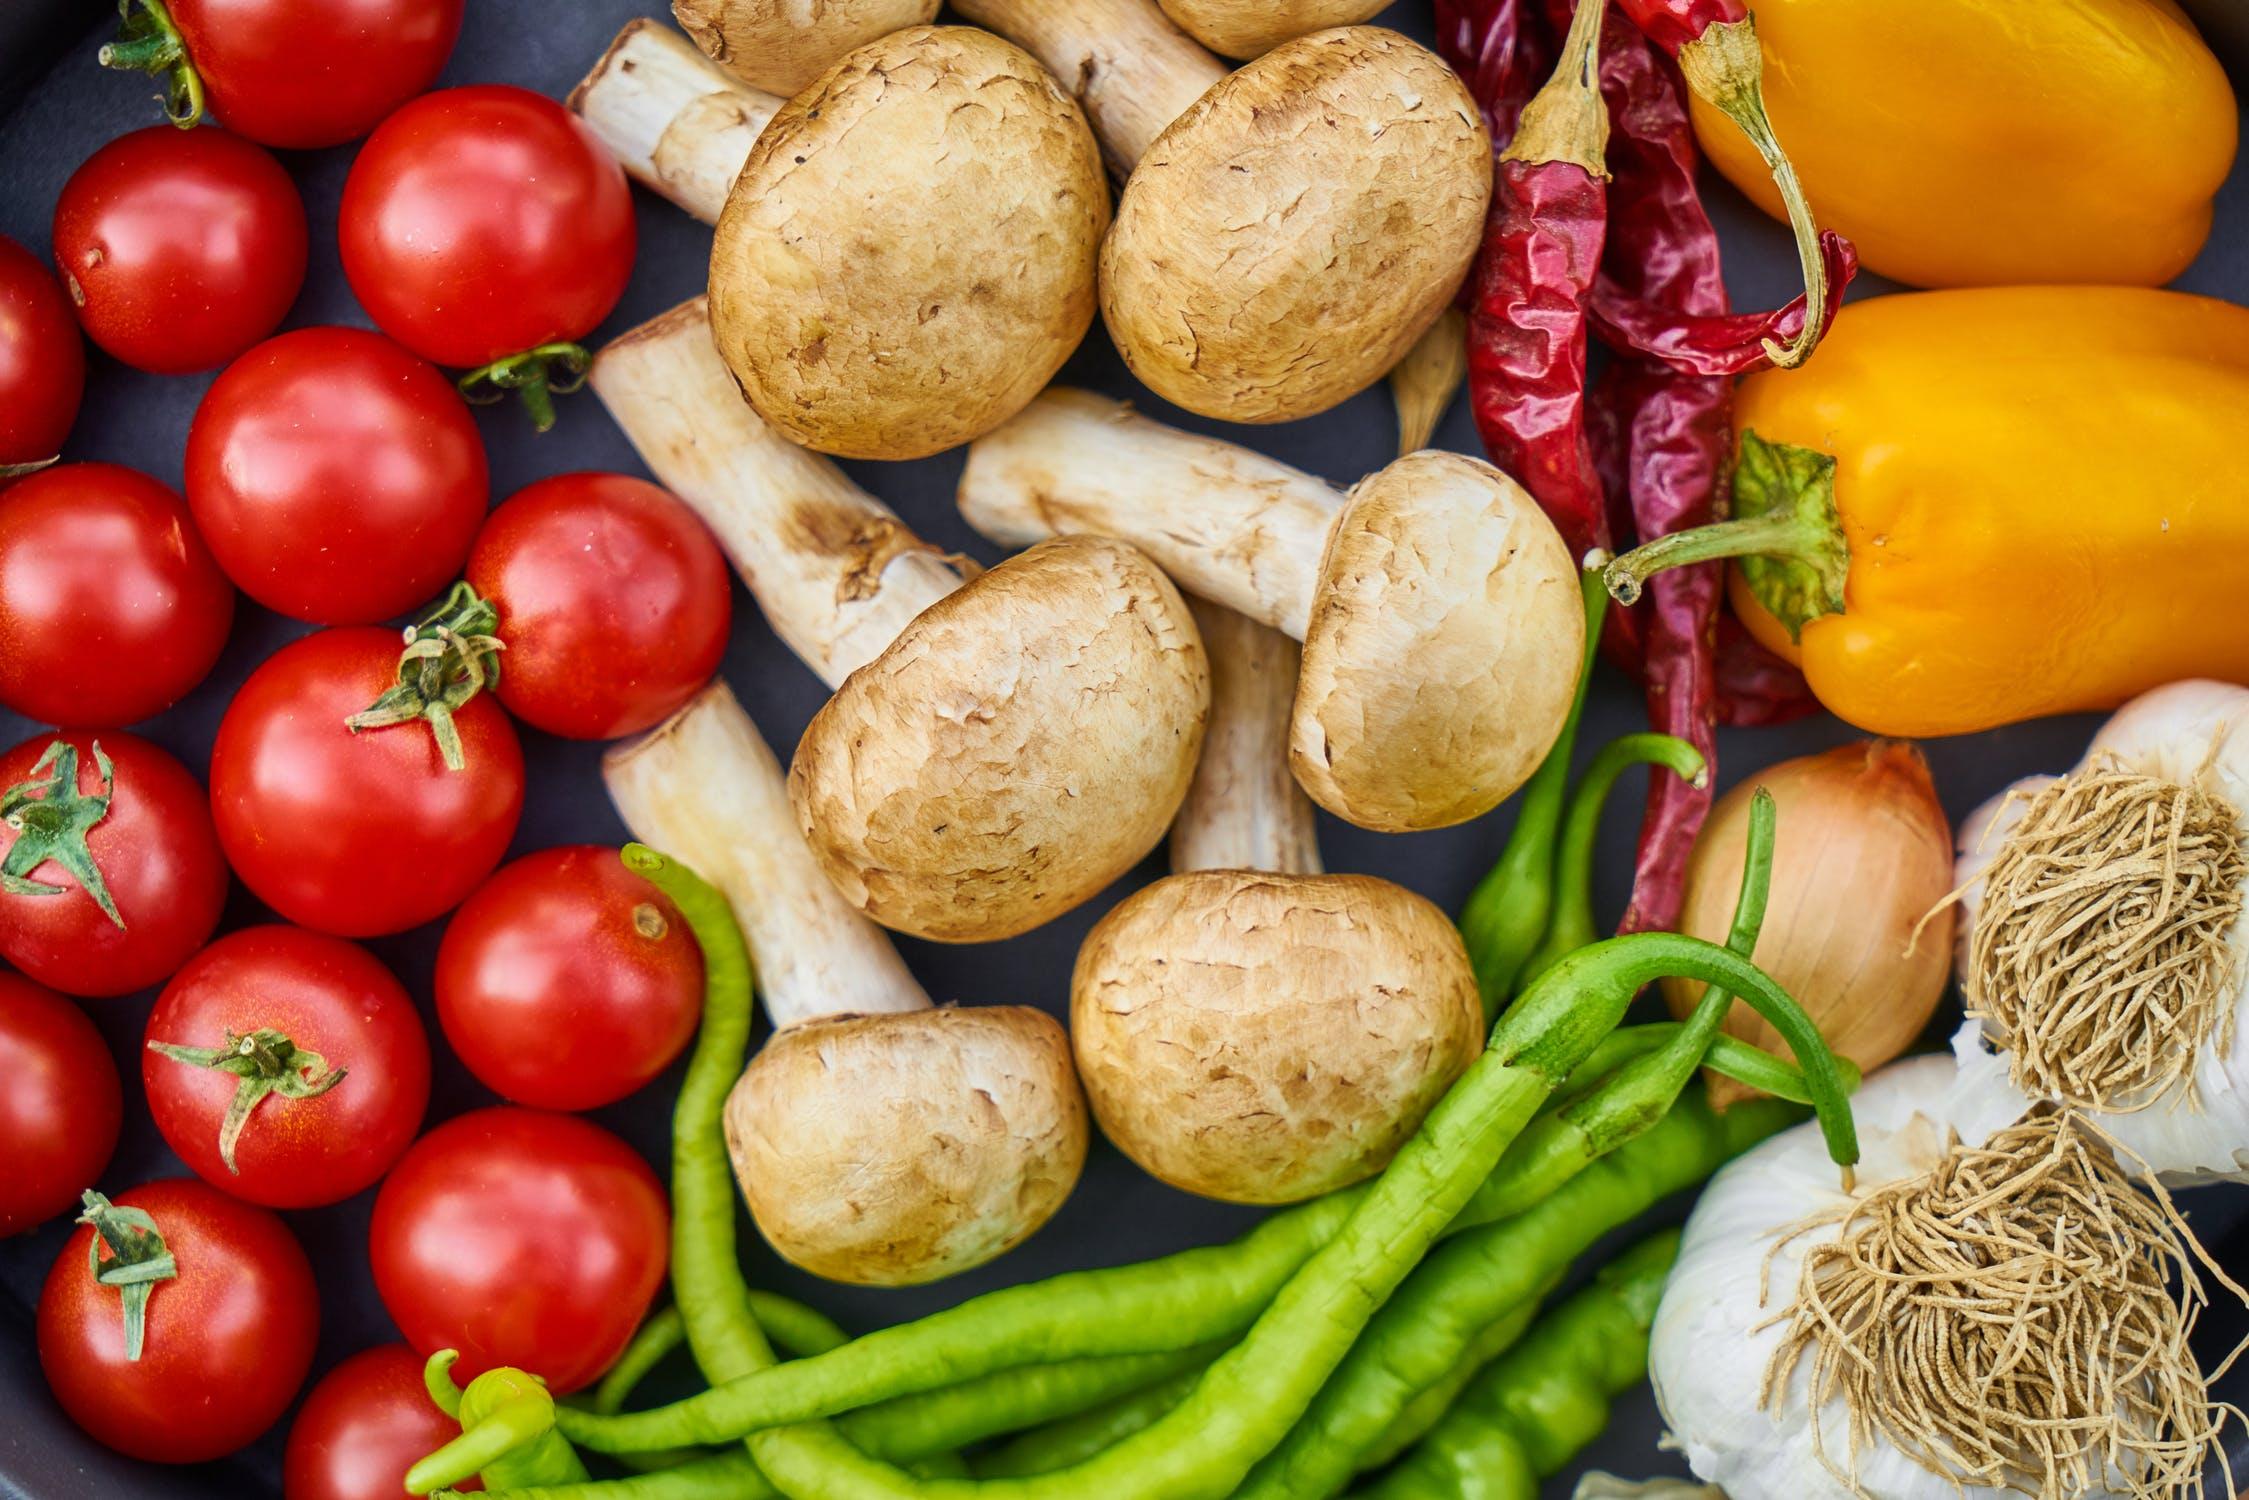 Ce inseamna pungi biodegradabile? Ce trebuie sa alegi!